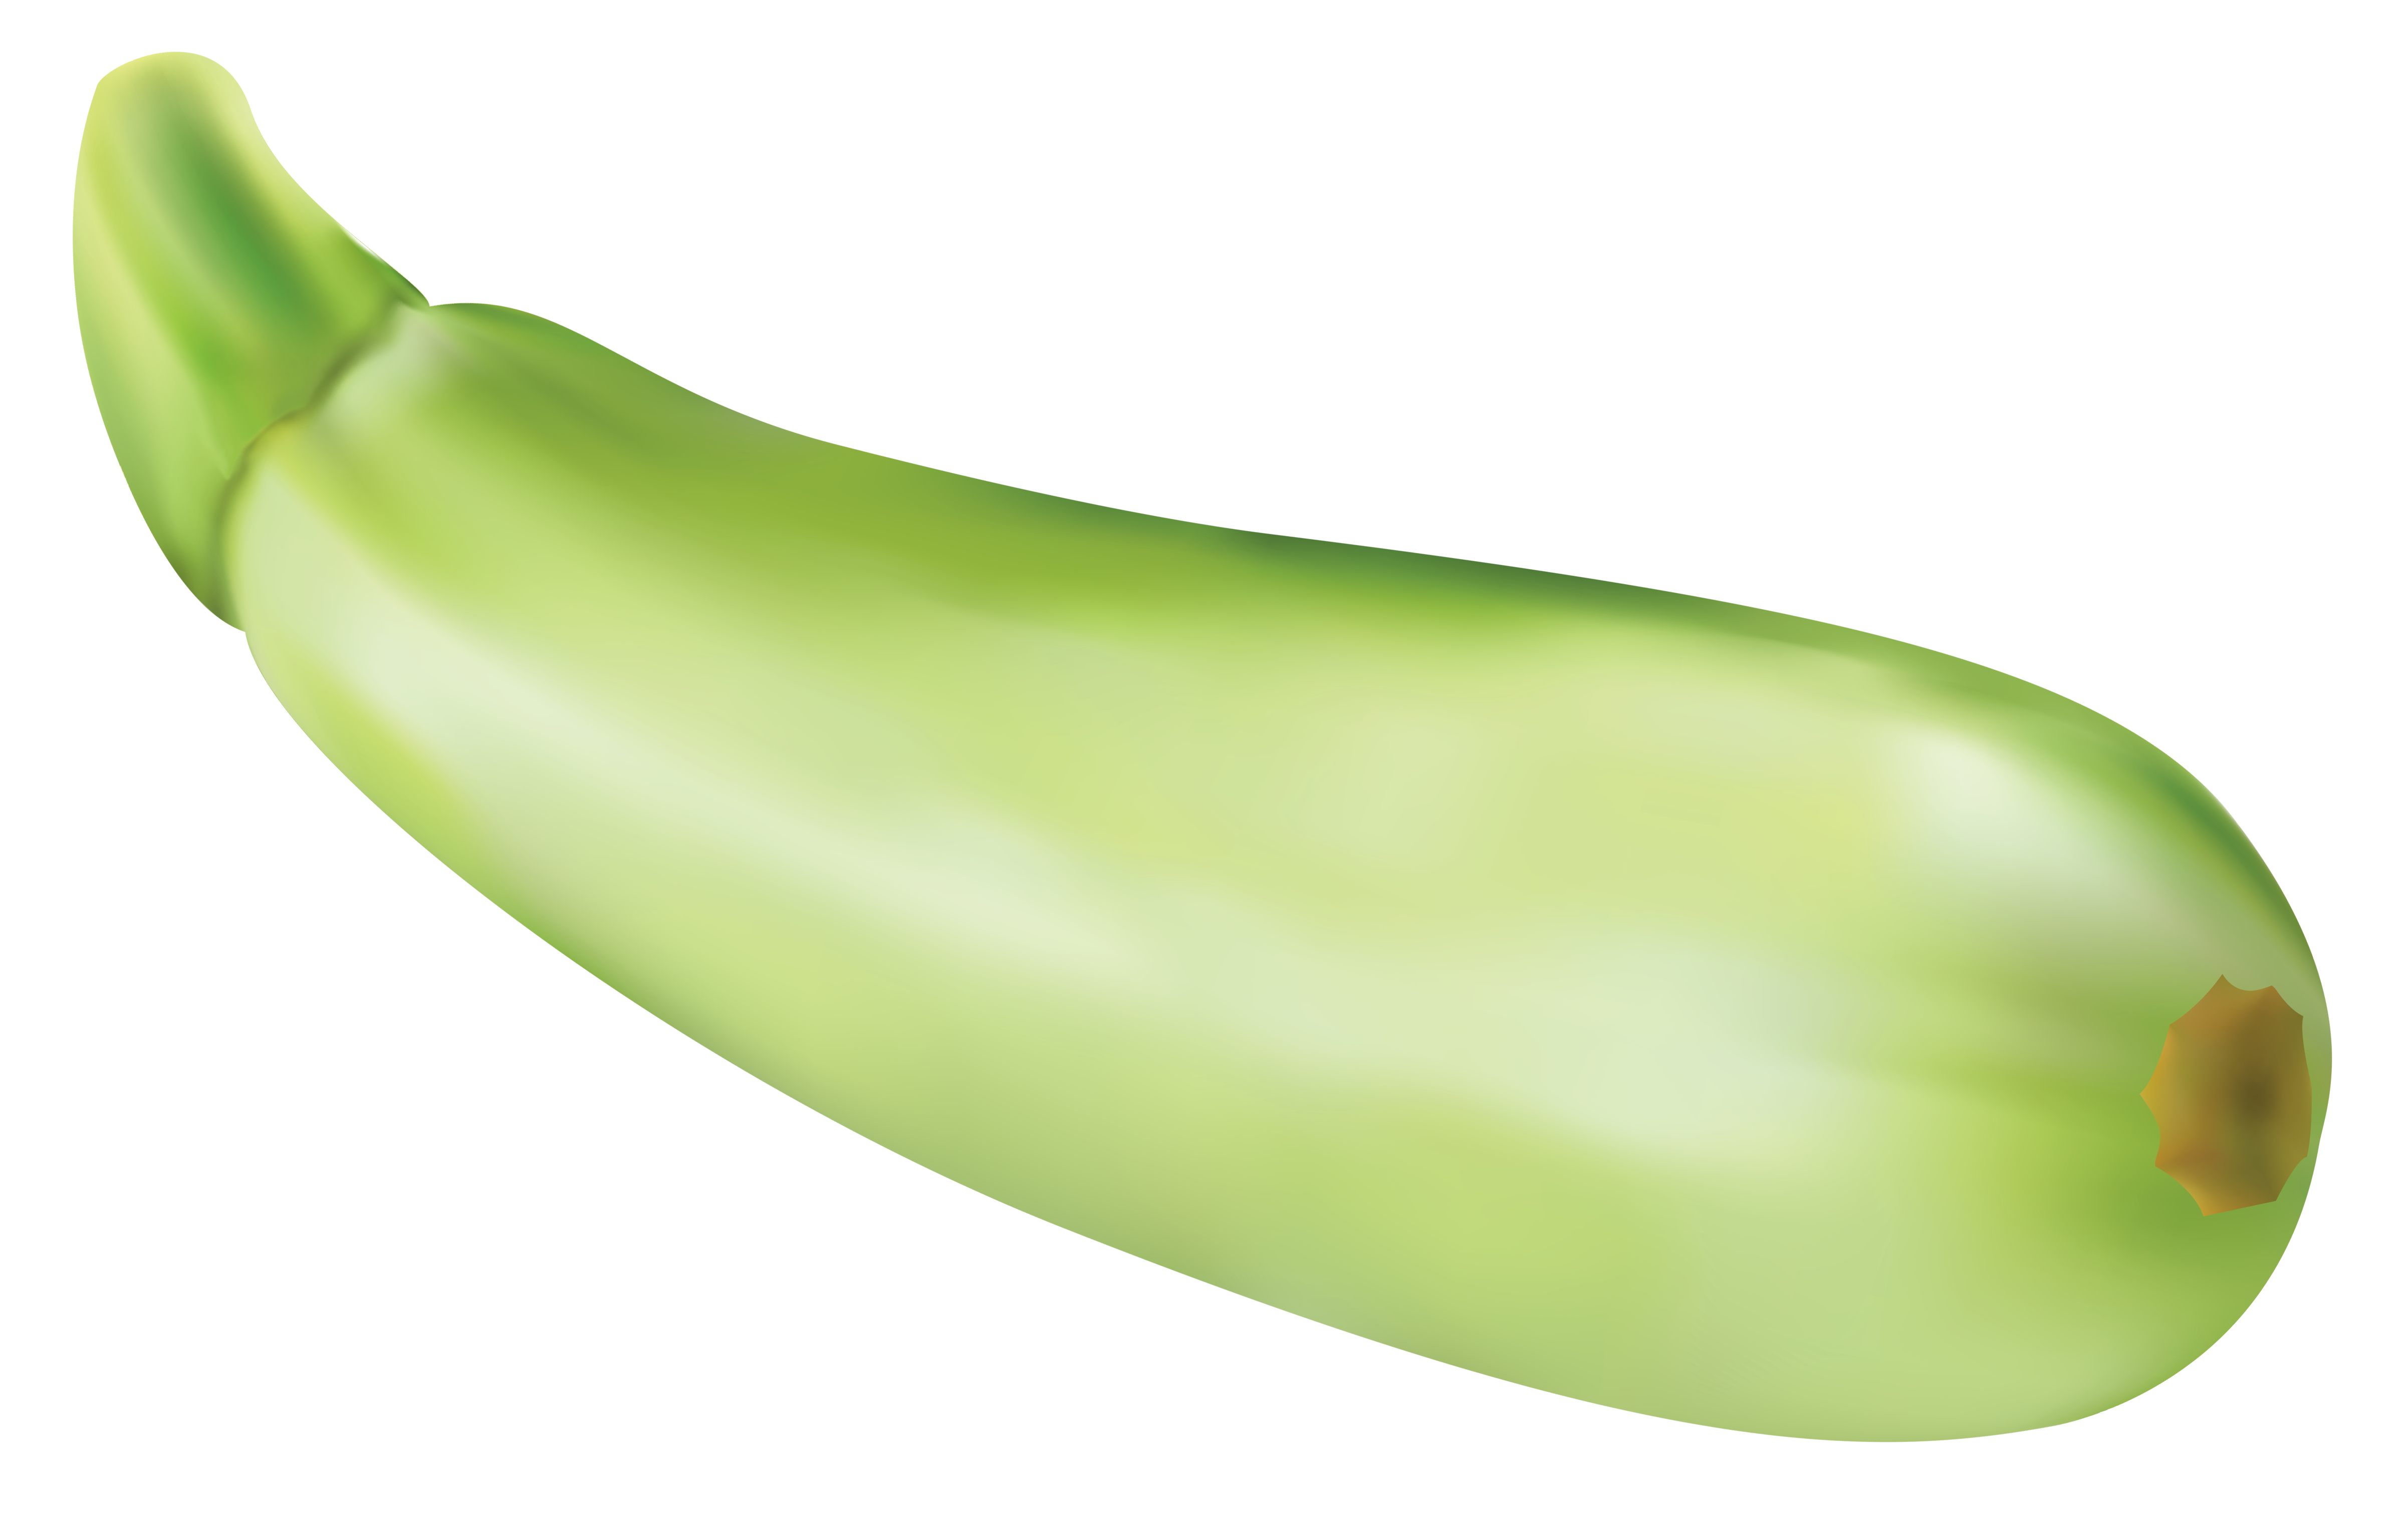 Zucchini clipart clipartall-Zucchini clipart clipartall-12